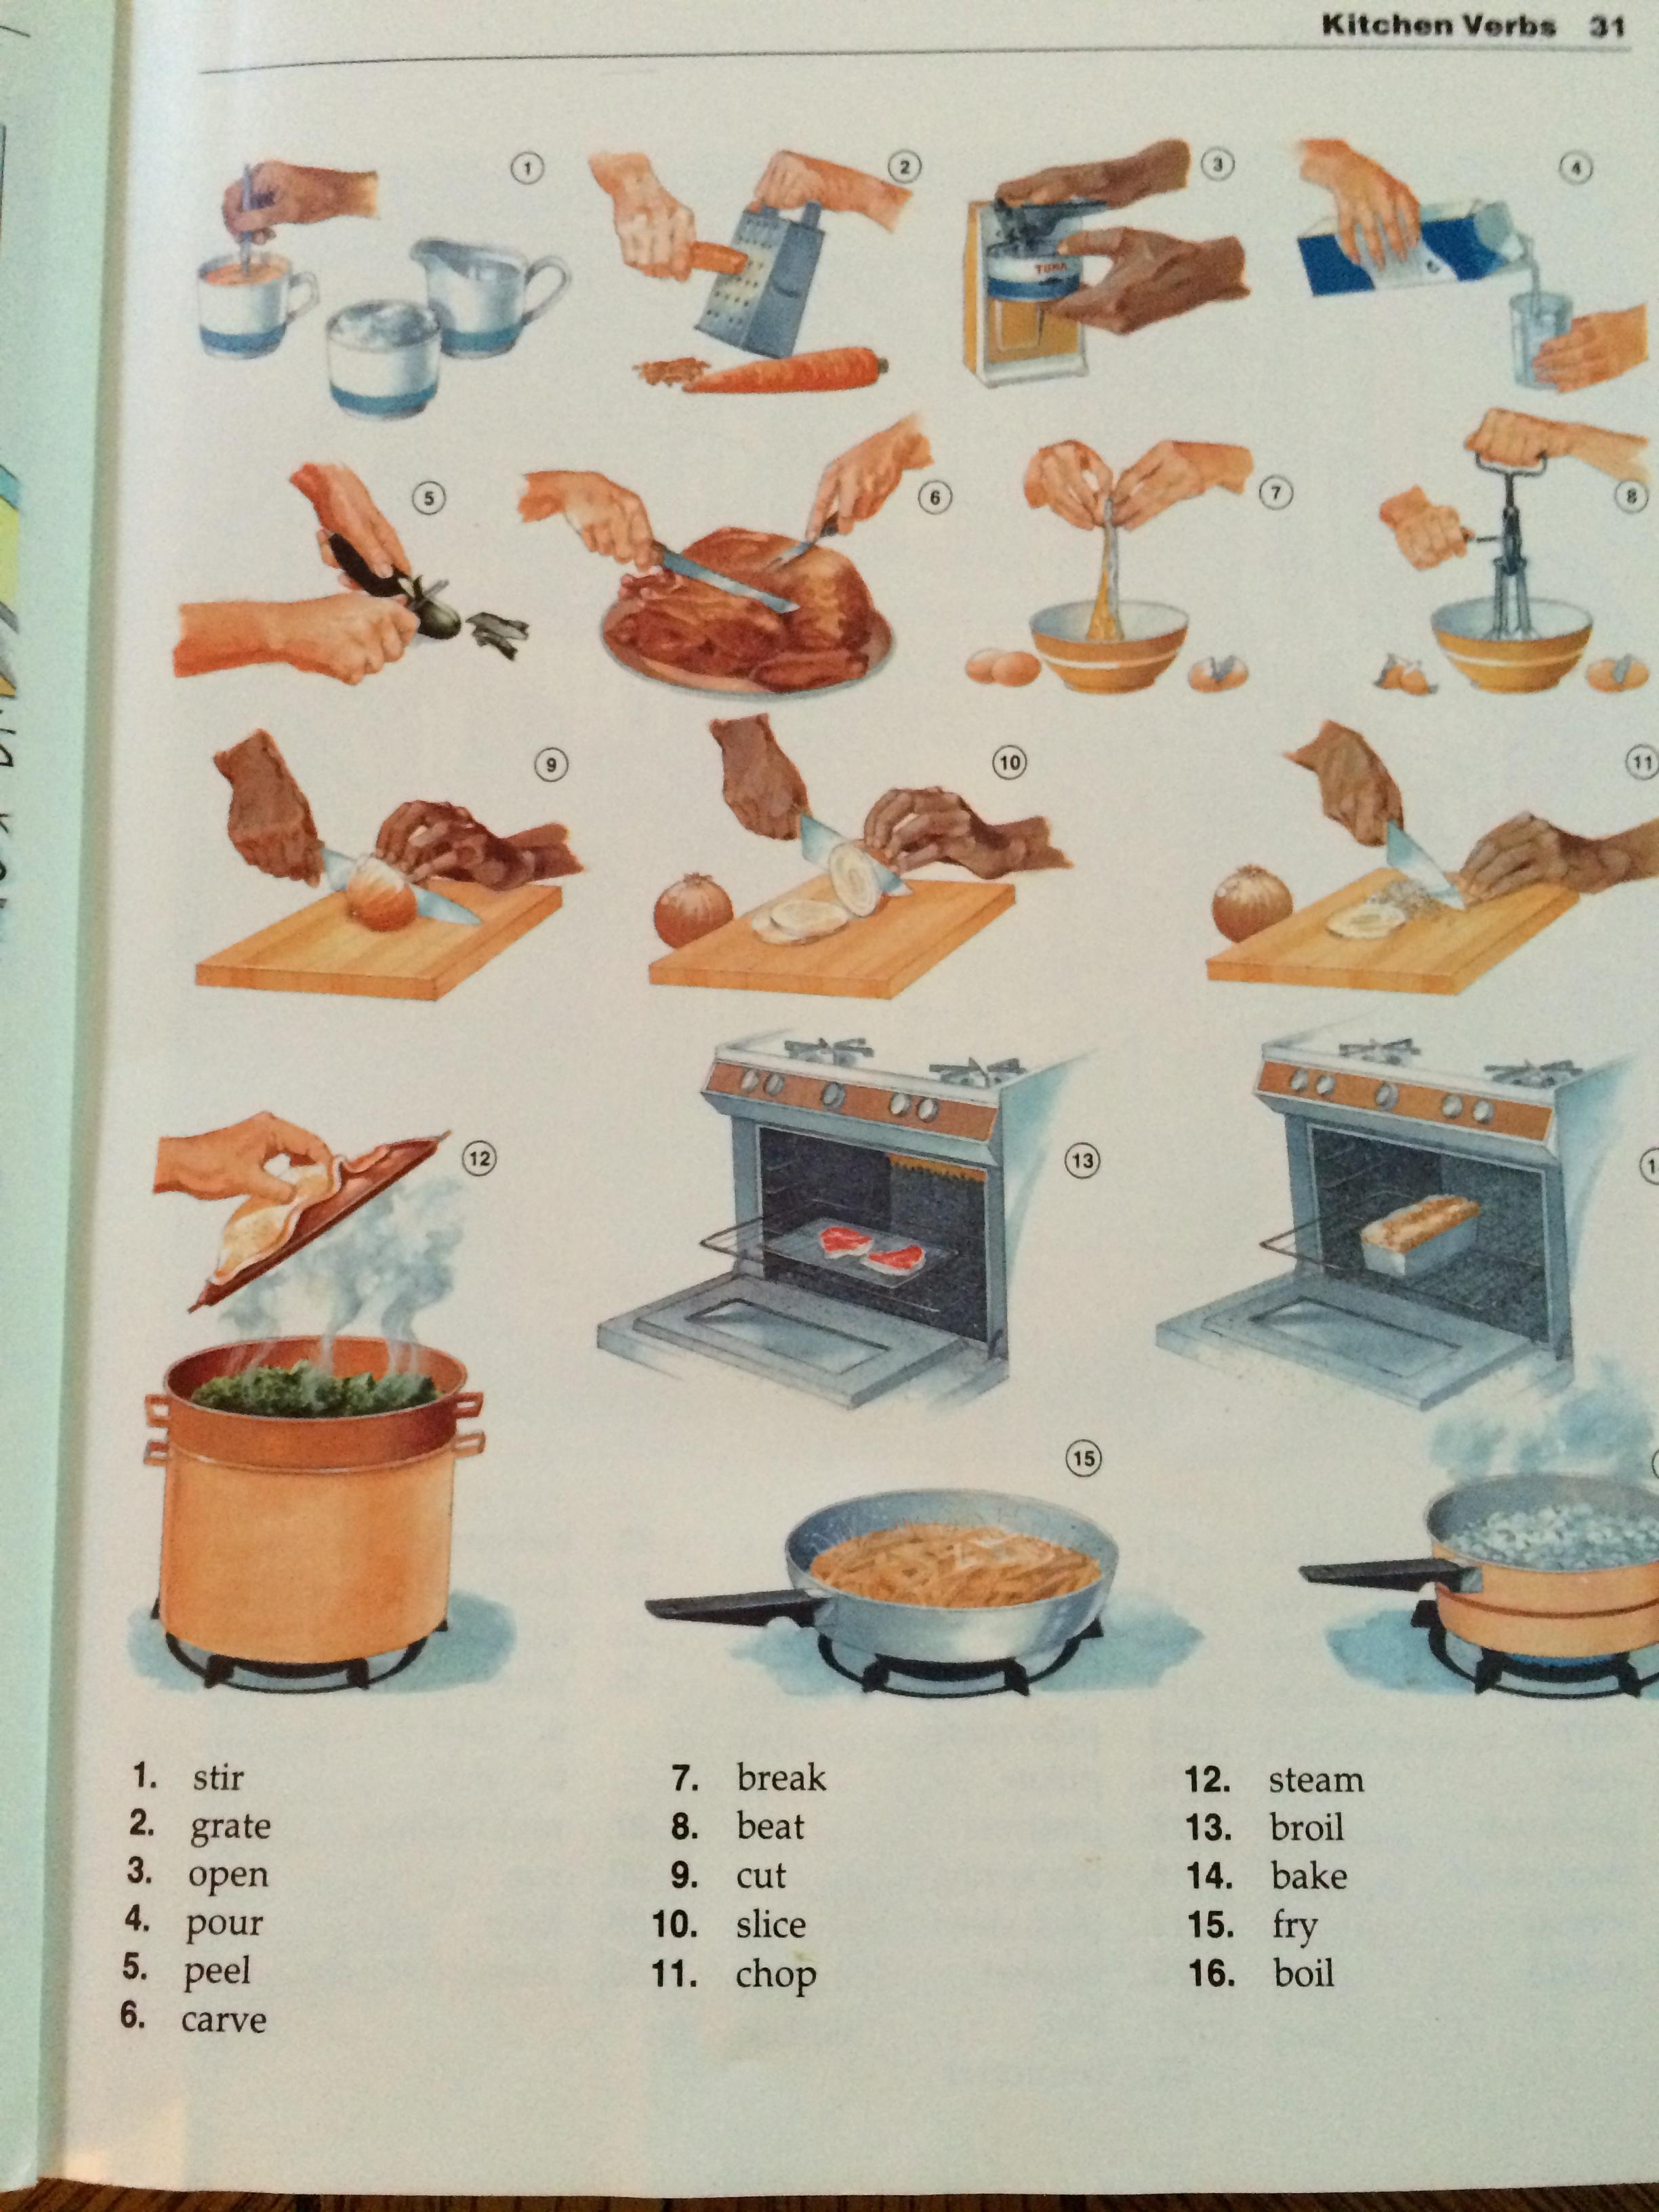 Cooking Verbs Words Sentences Verb Tenses Questions